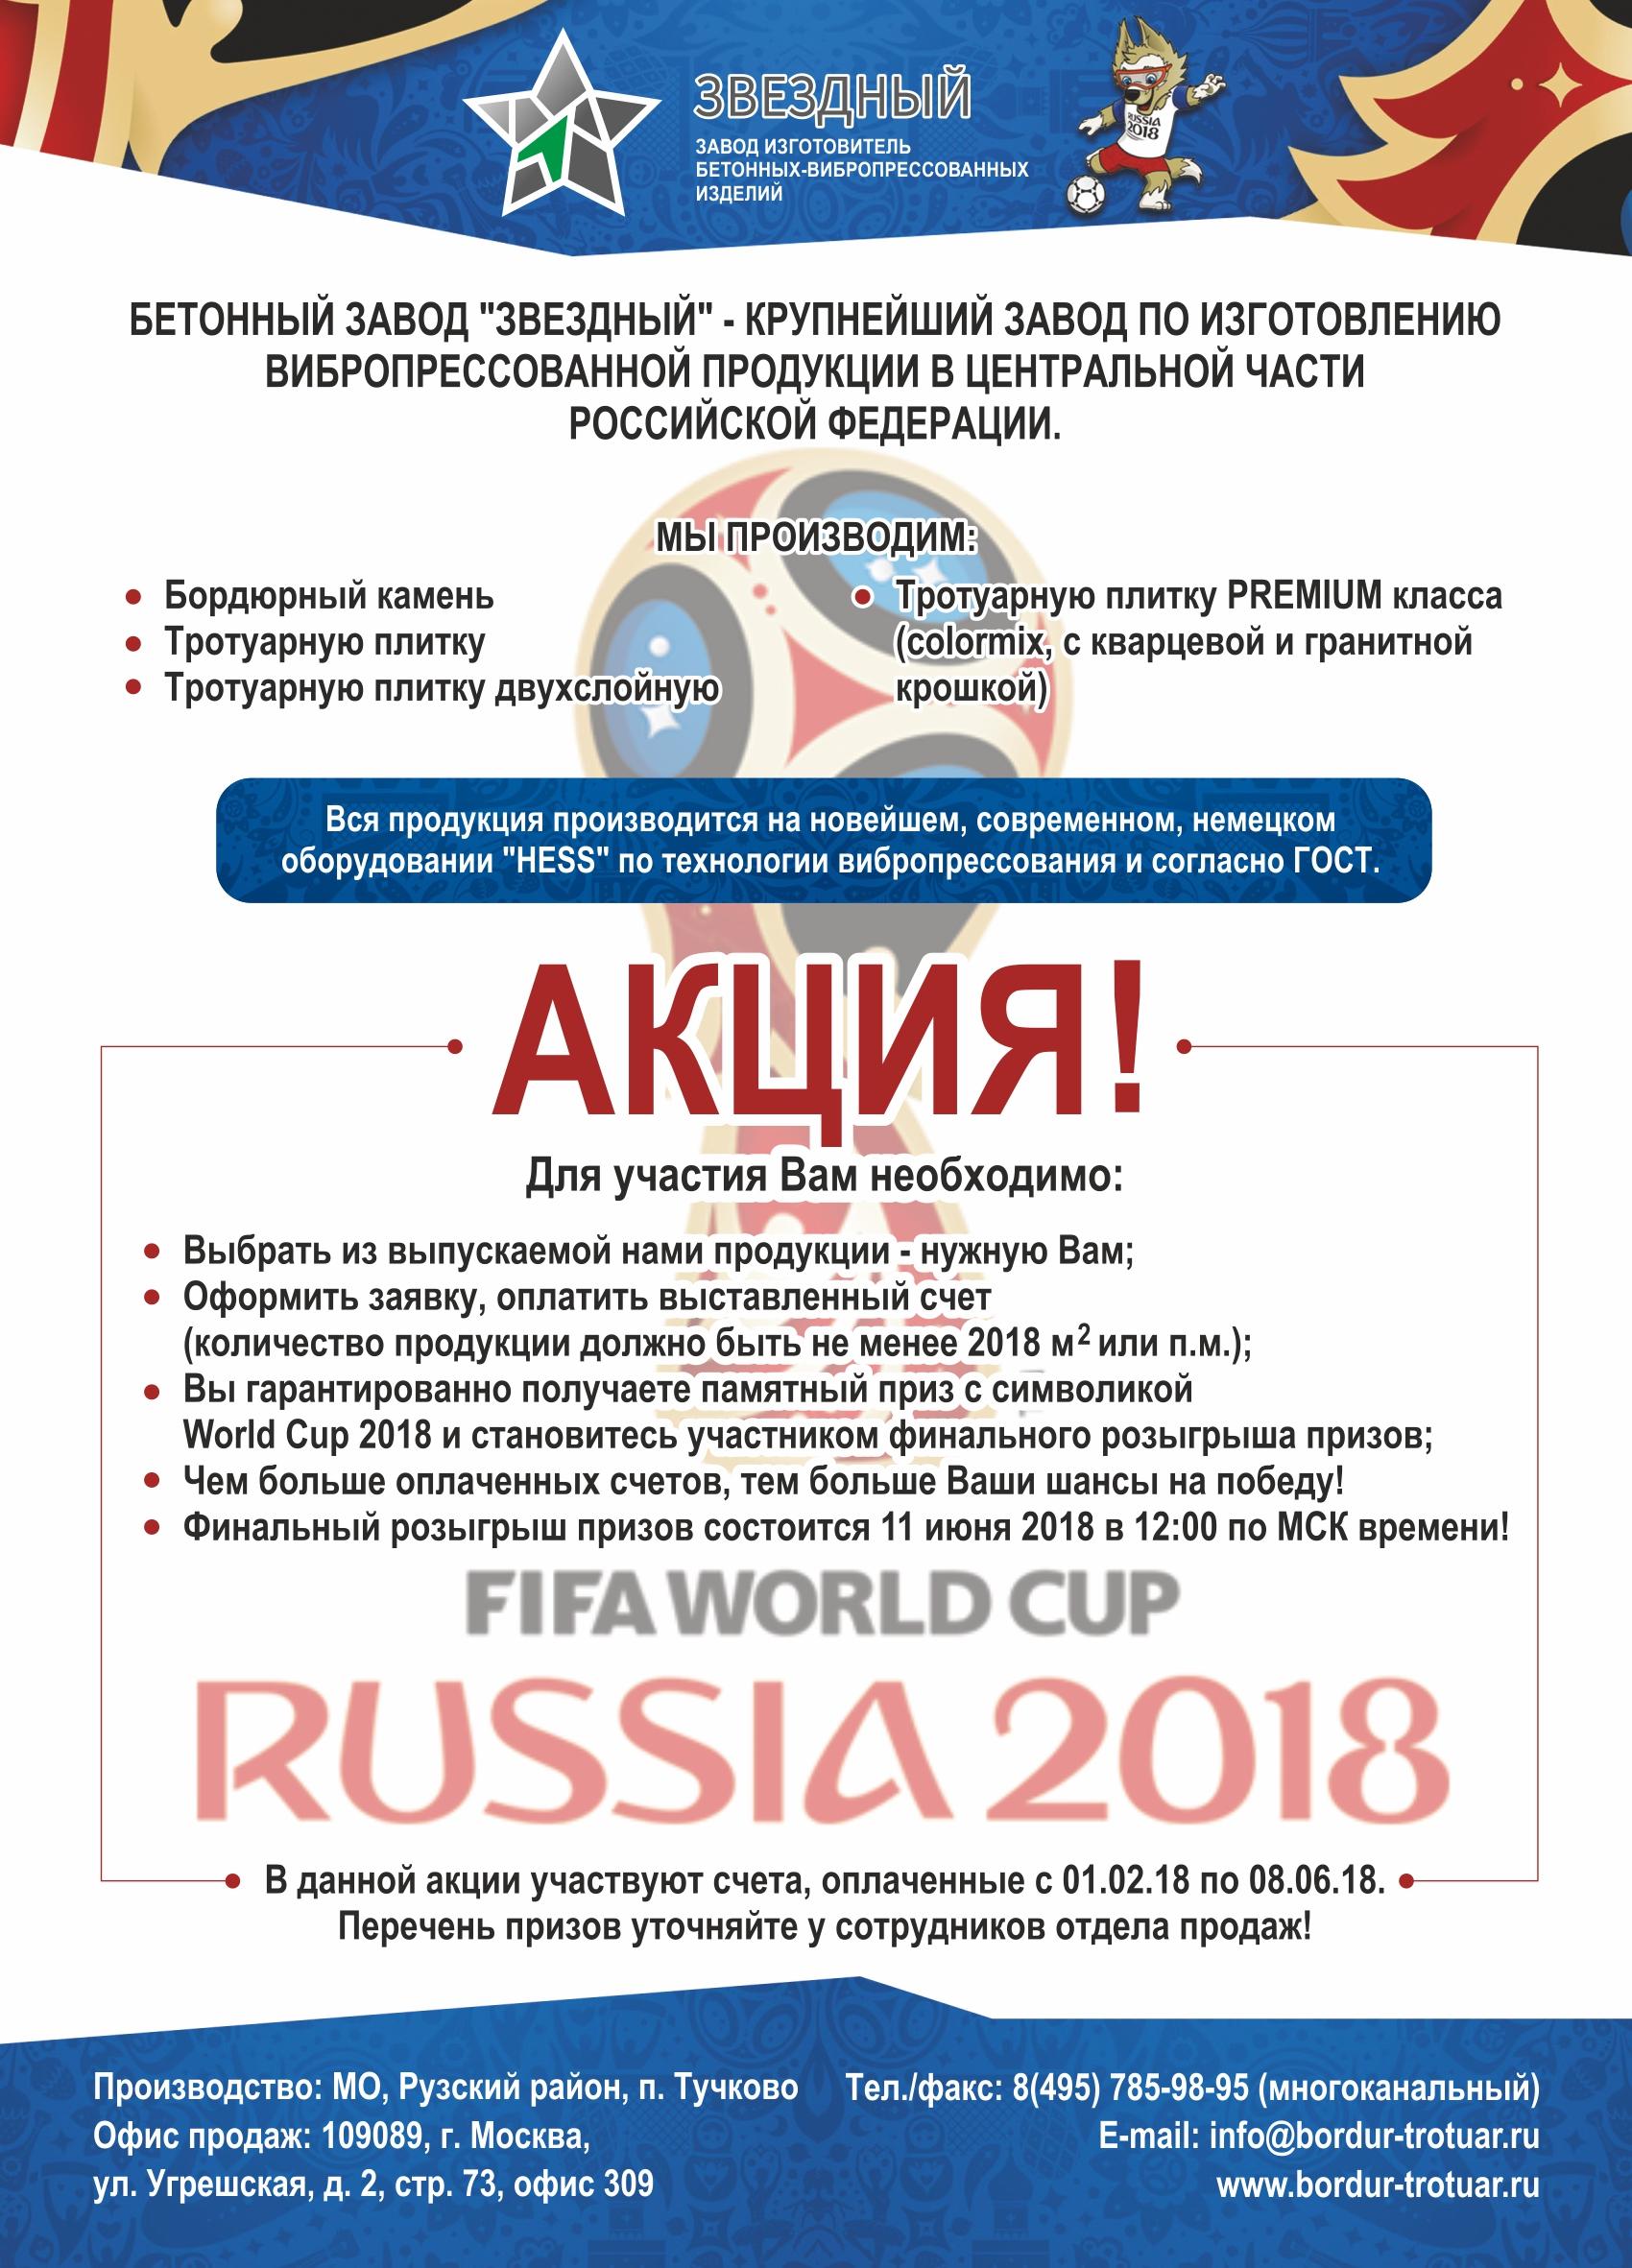 A4_Zvezda_Futbol__5_.jpg